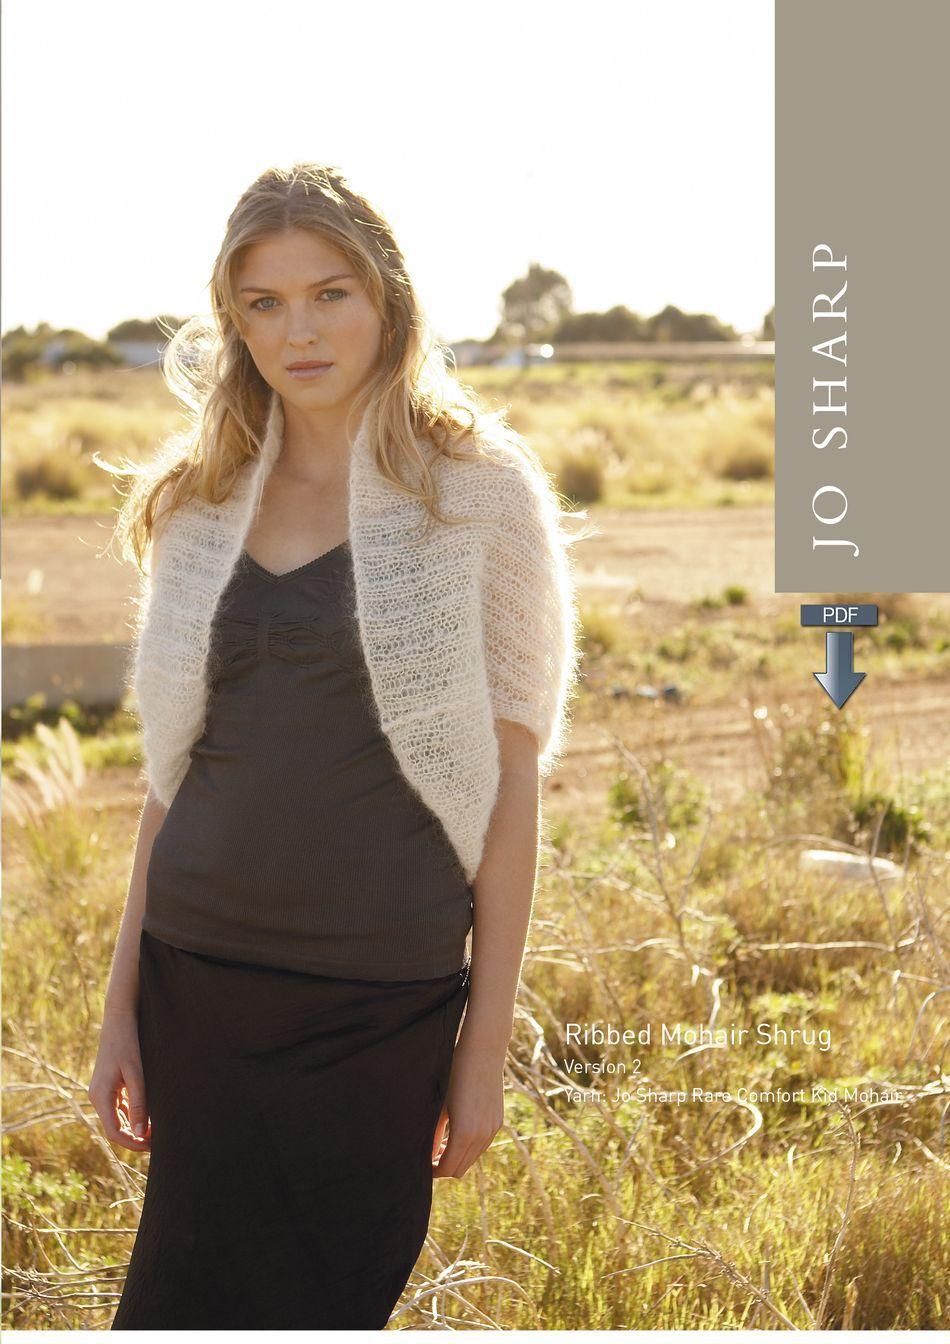 Jo Sharp Ribbed Mohair Shrug Pattern - Pattern Download, Knitting ...